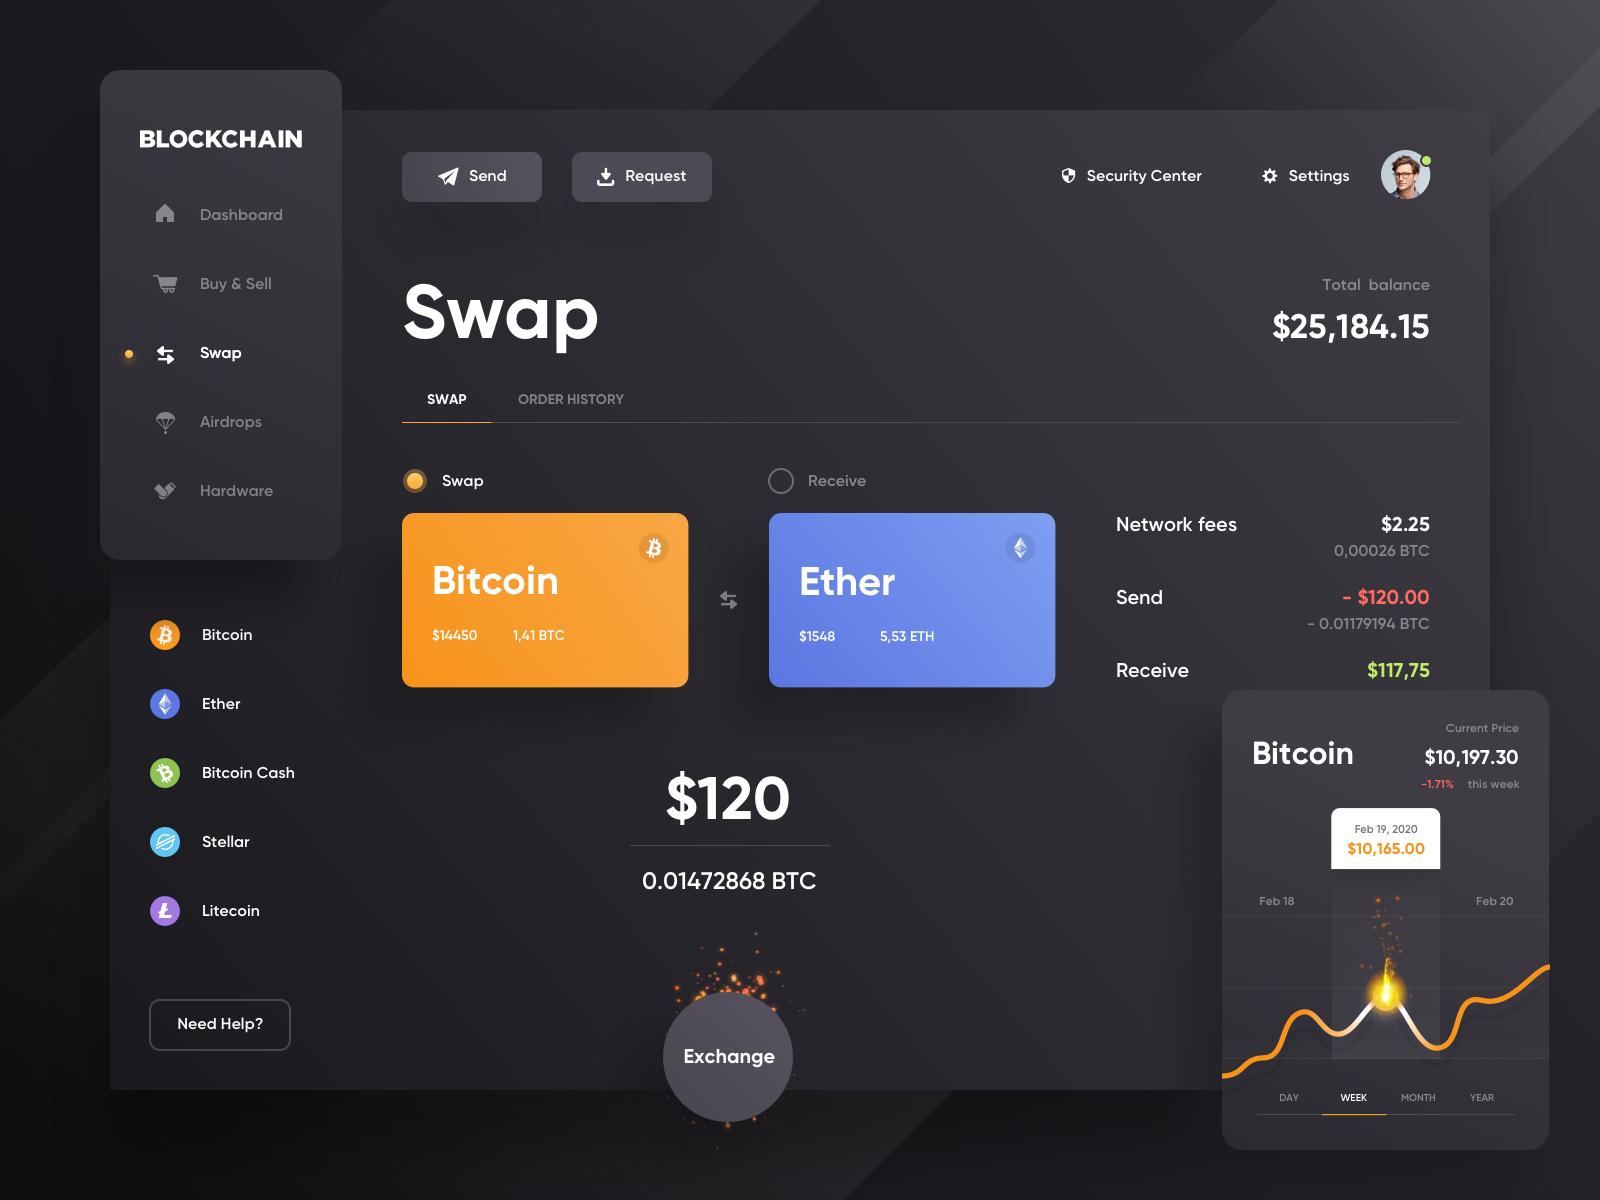 Blockchain — Swap